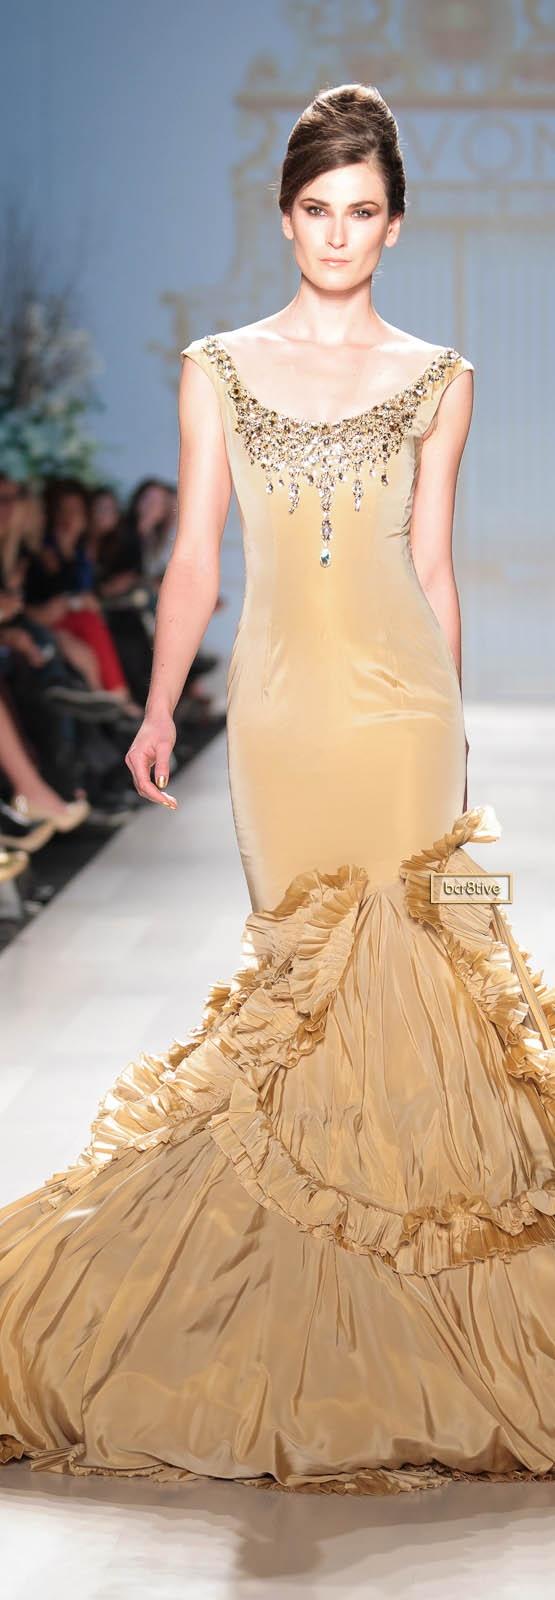 best designer evening gowns images on pinterest long dresses